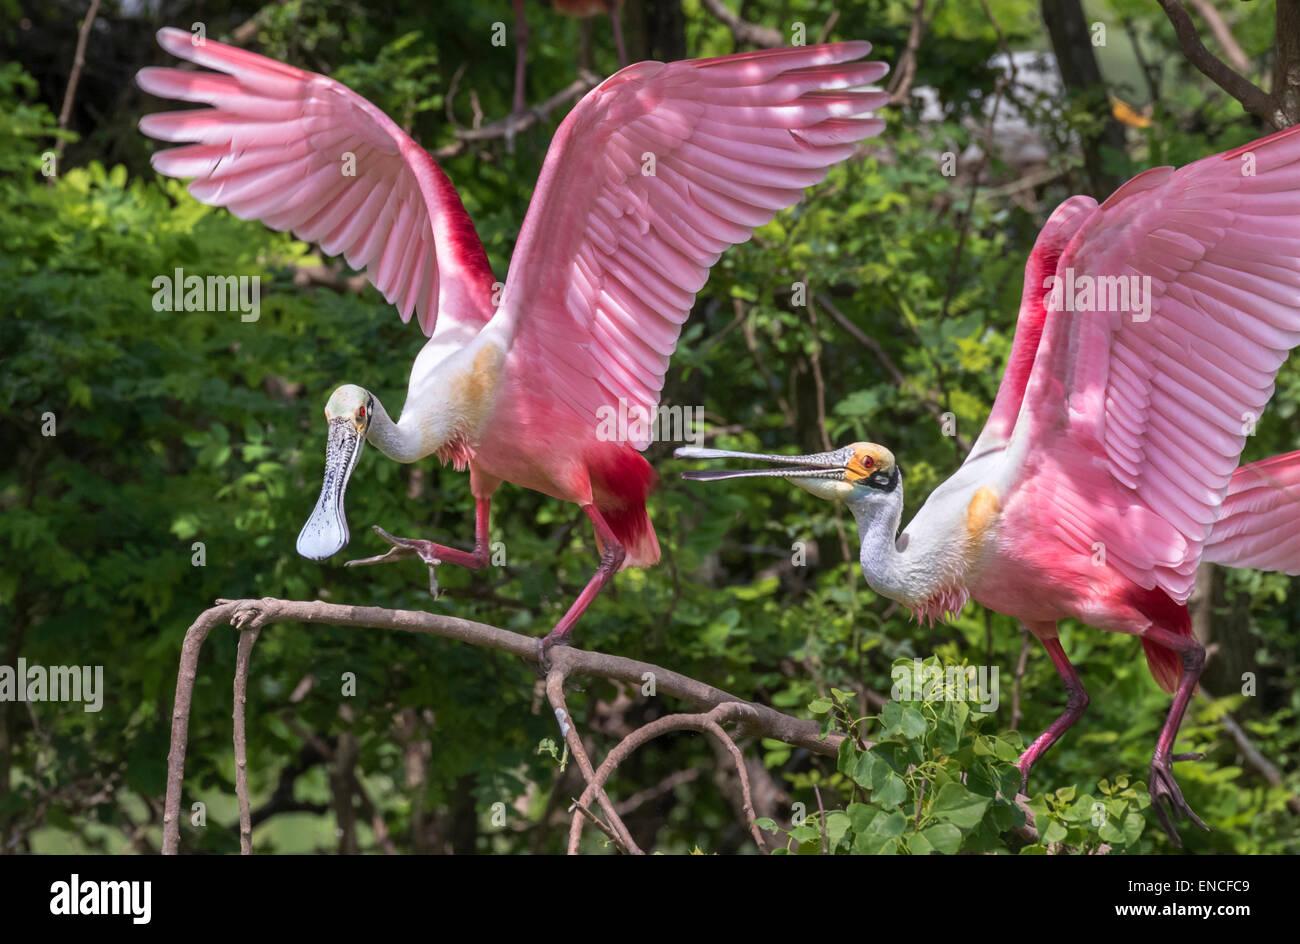 Ein Konflikt zwischen rosige Löffler (Platalea Ajaja) am Rookery, High Island, Texas, USA. Stockbild